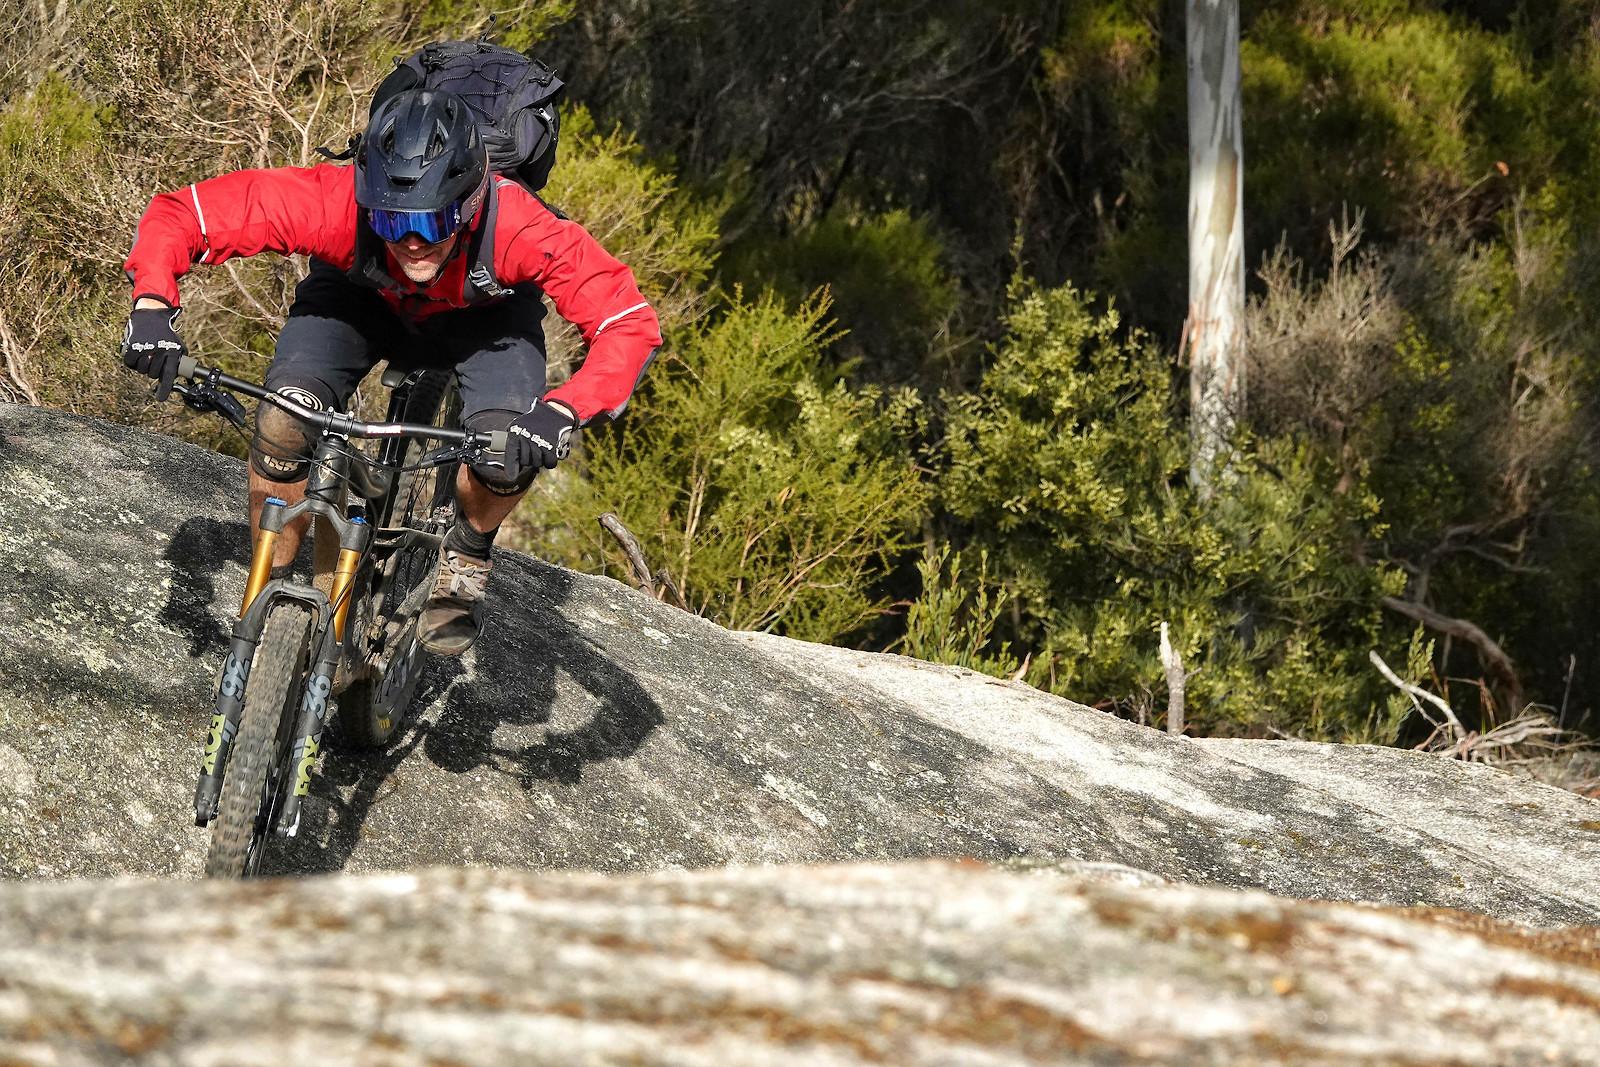 Trouty, Blue Derby - digitalhippie - Mountain Biking Pictures - Vital MTB